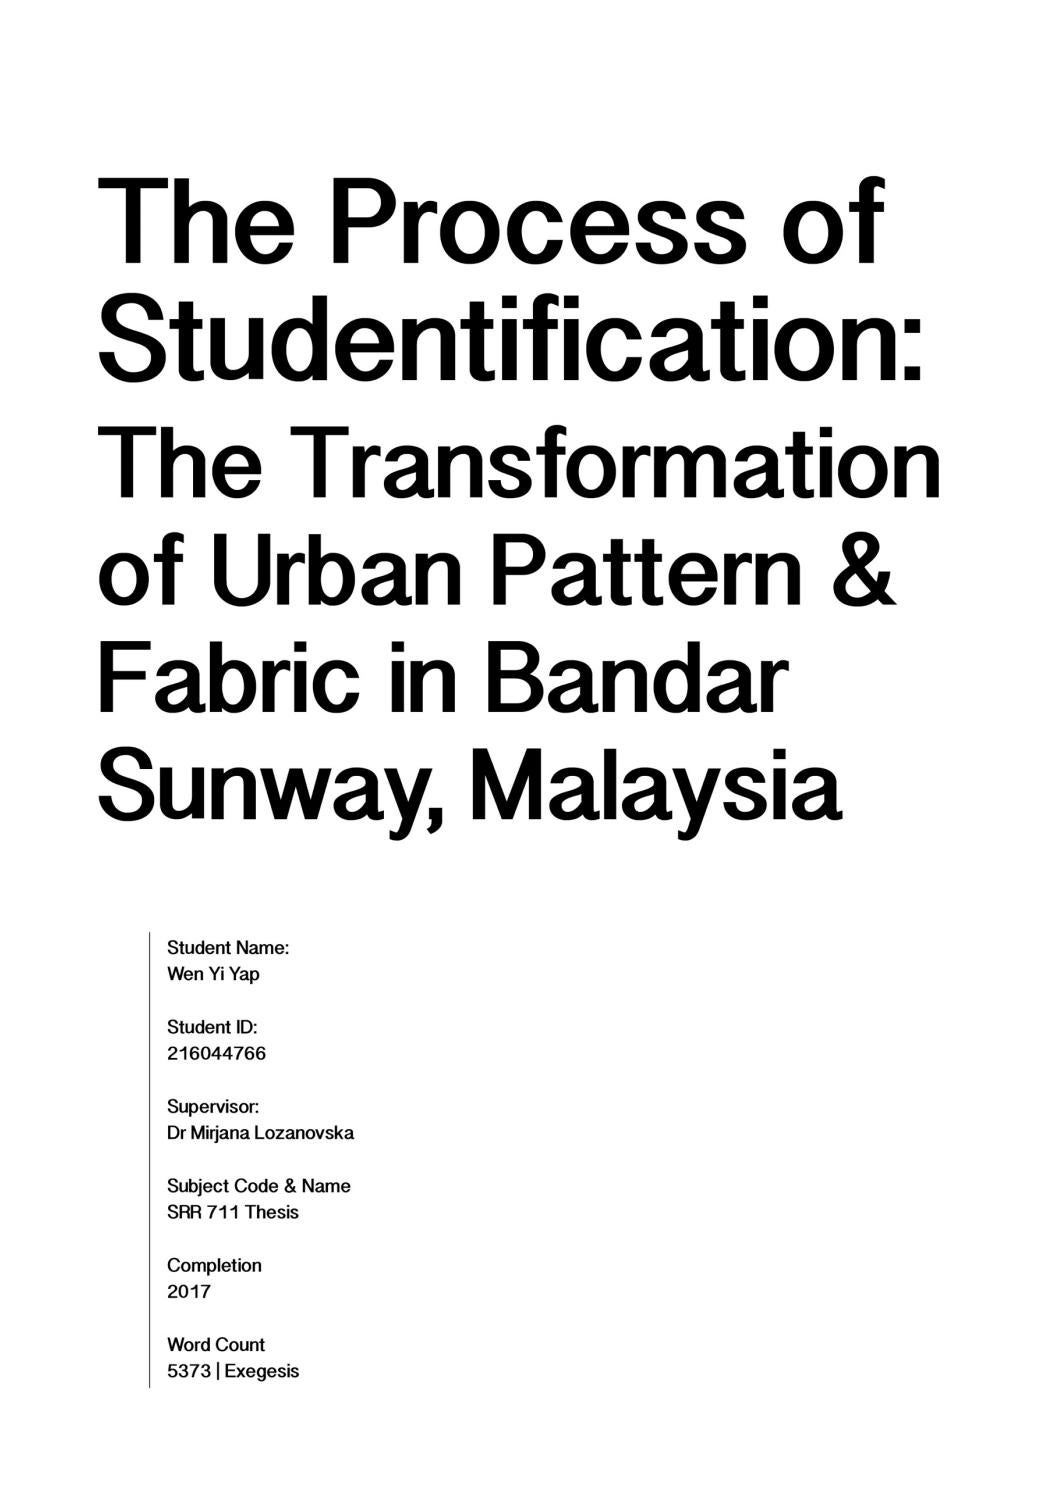 Dissertation studentification